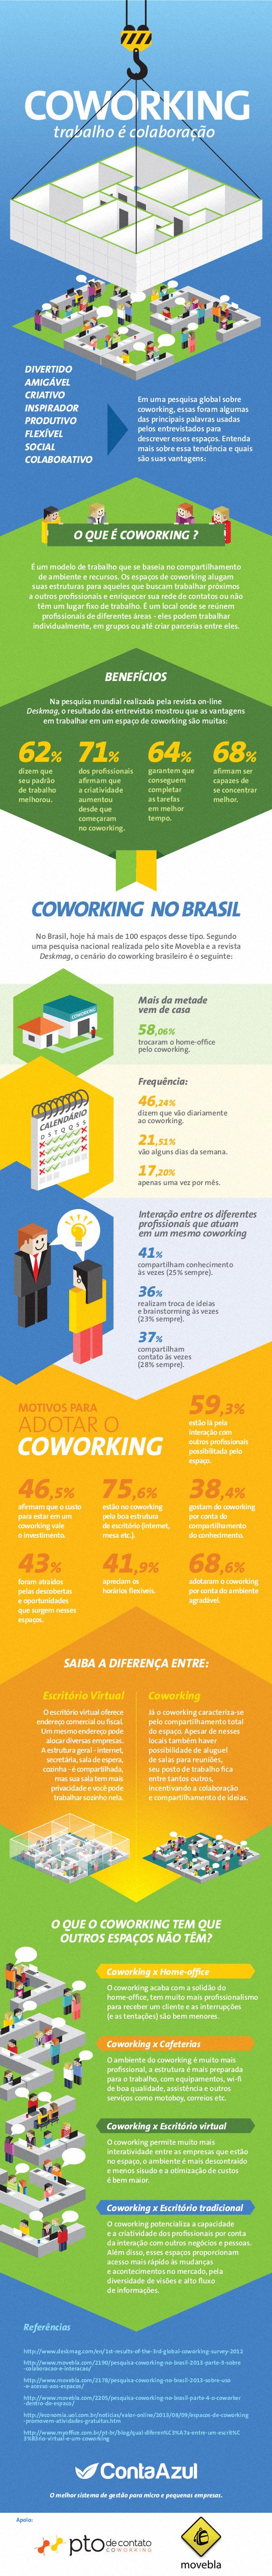 coworking infografico.jpg